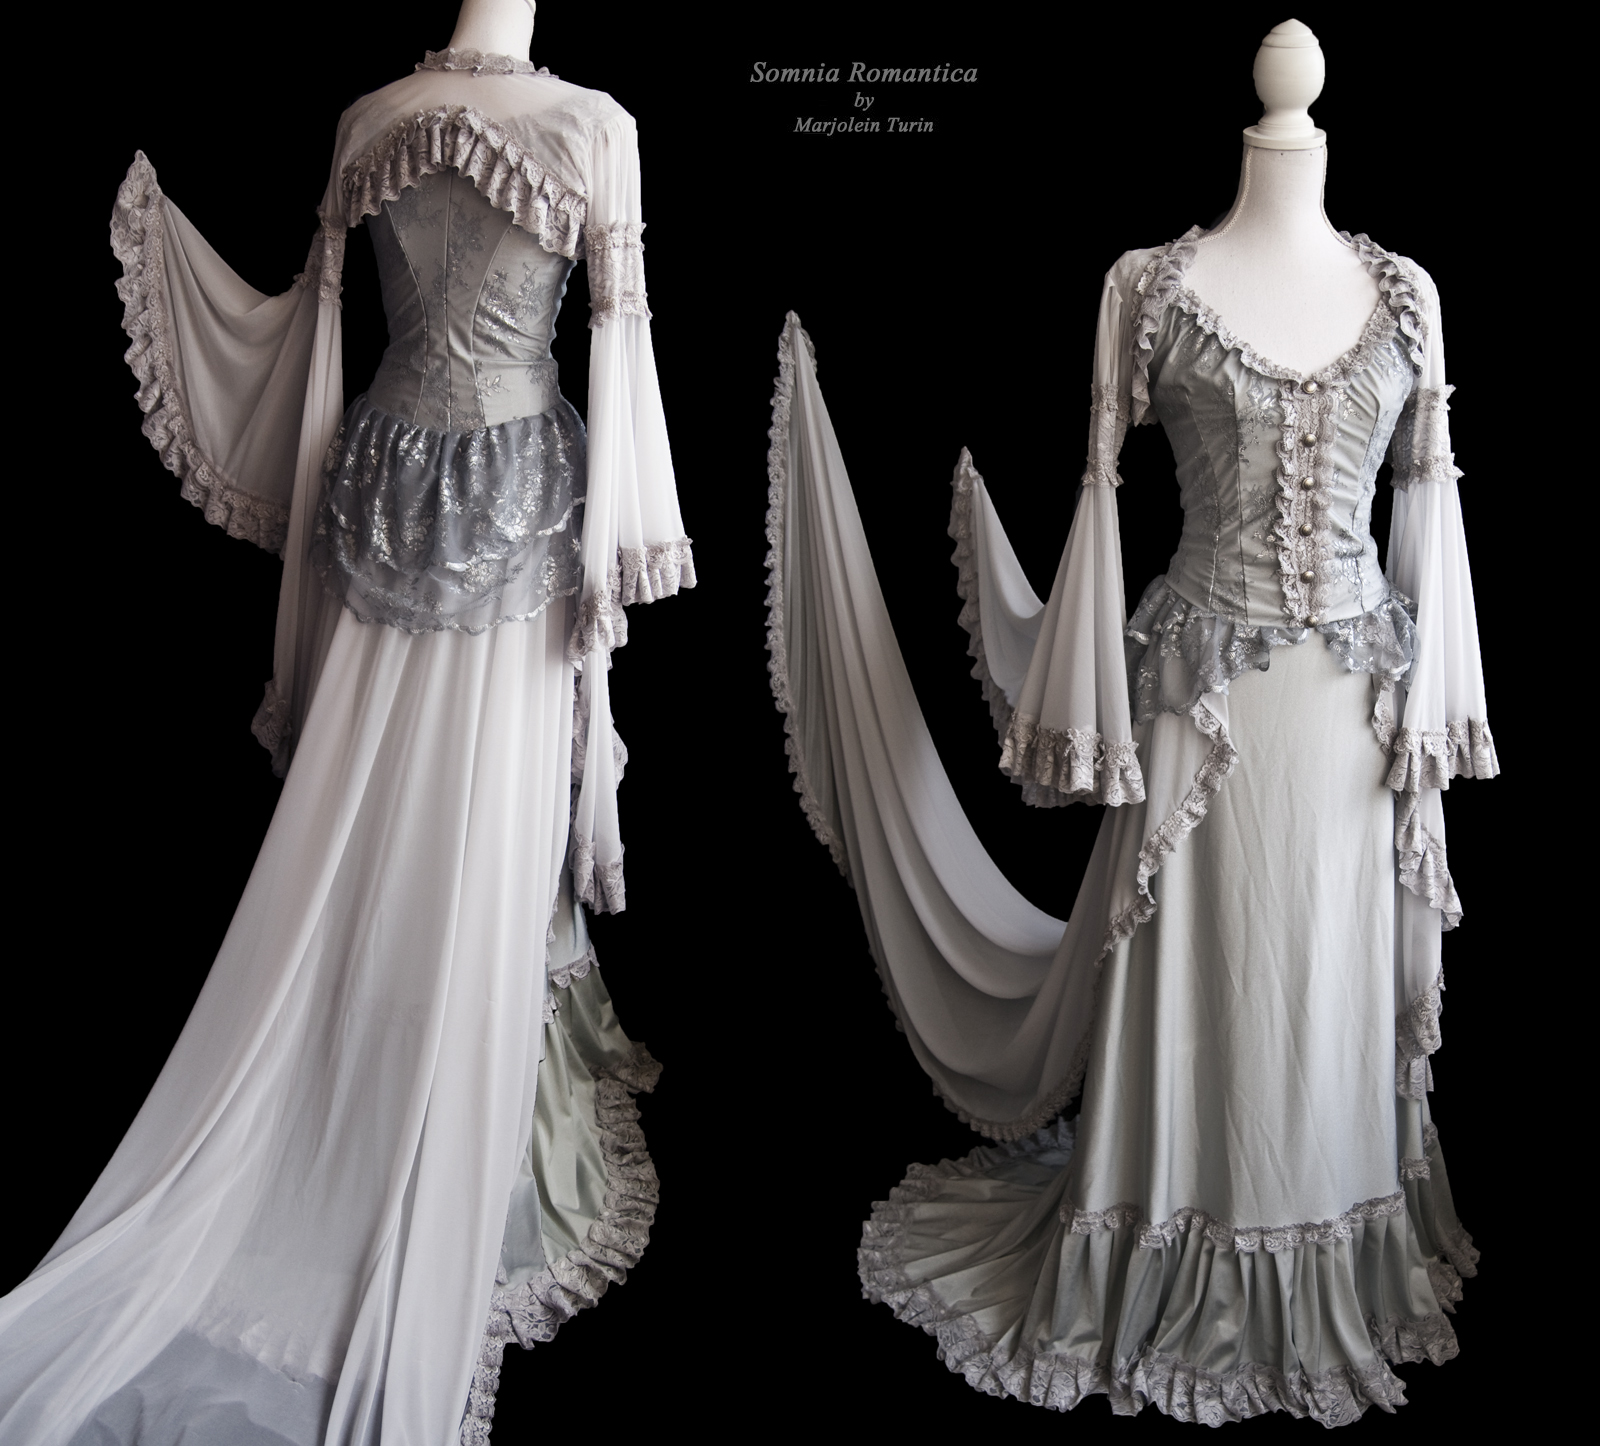 Angelic dress, Somnia Romantica by Marjolein Turin by SomniaRomantica